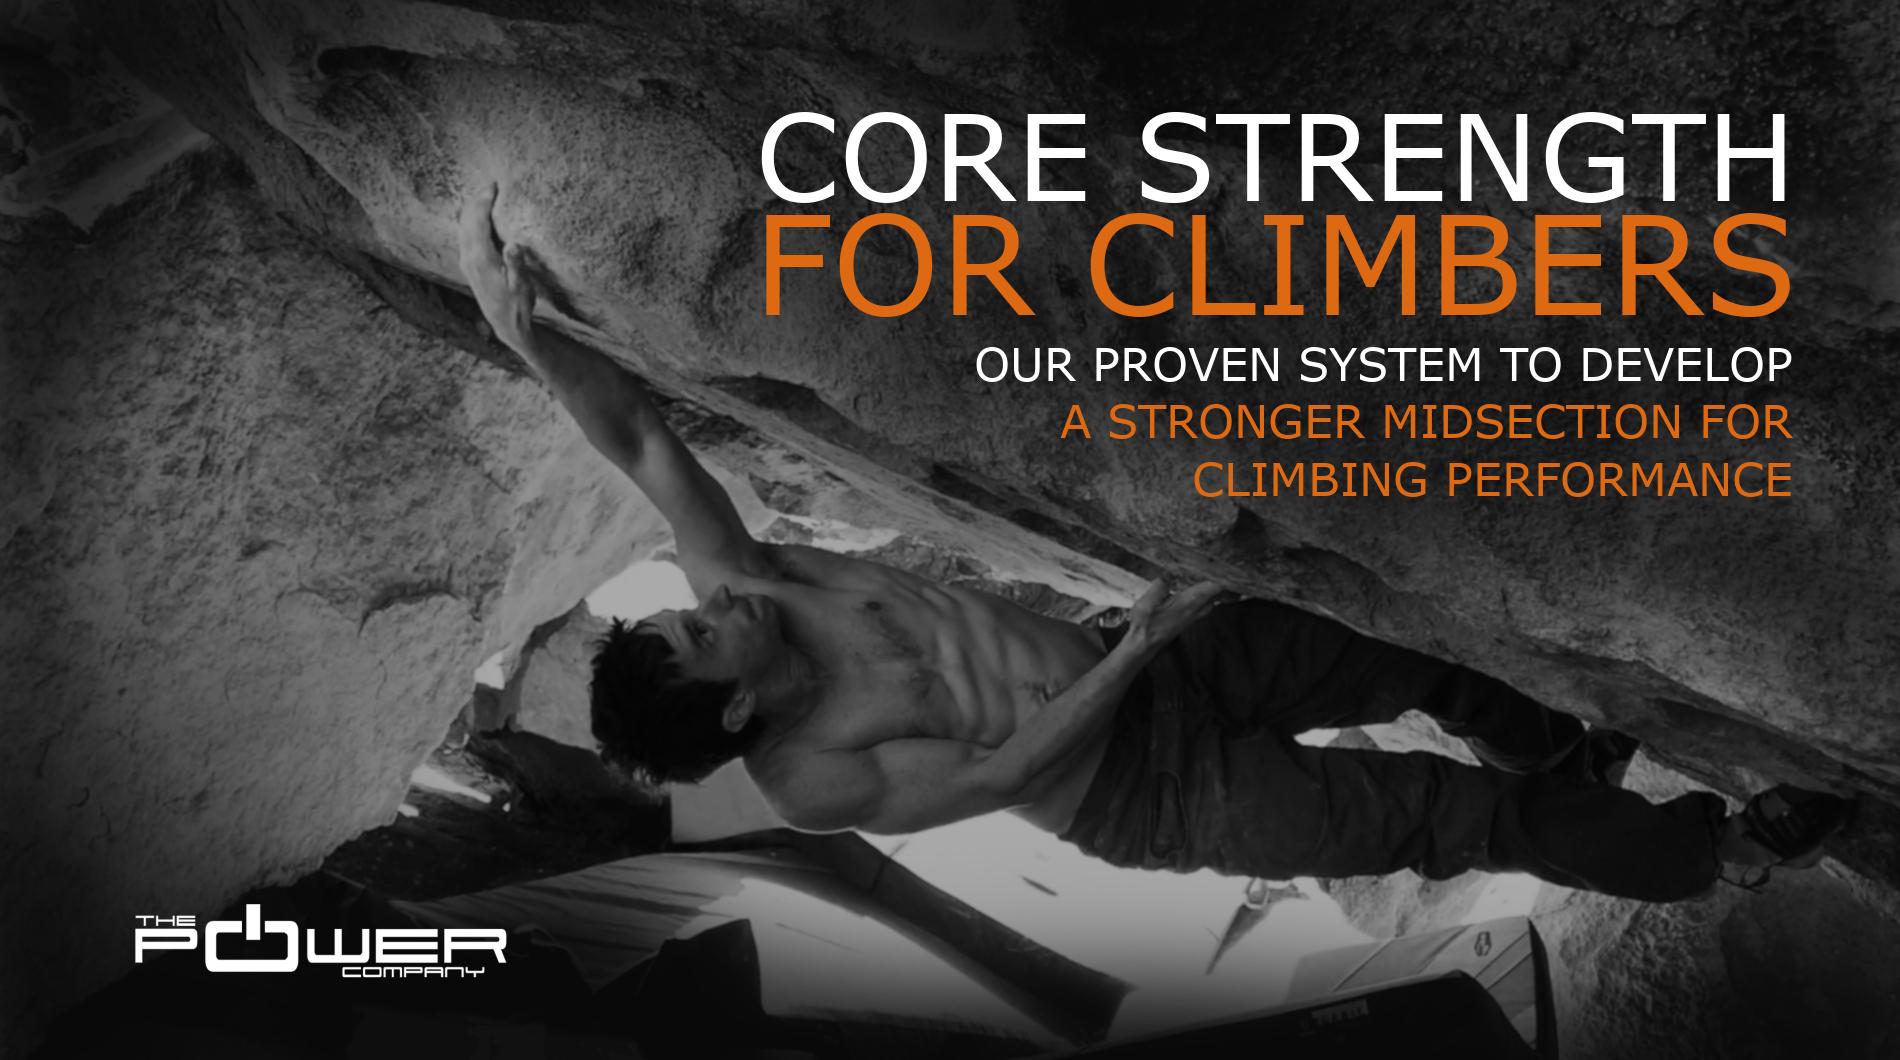 core_strength_for_climbers.jpg